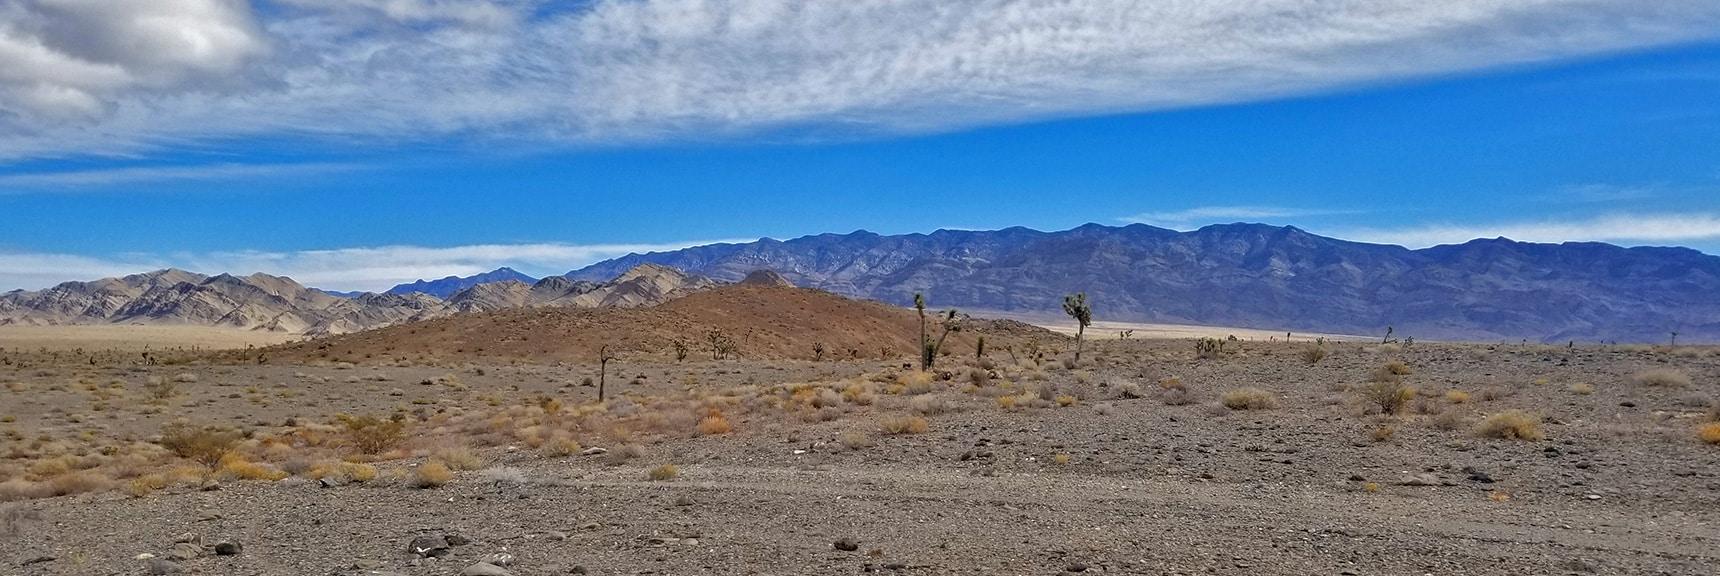 Northwestern Sheep Range Viewed from Alamo Road   Lower Alamo Road   Sheep Range   Desert National Wildlife Refuge, Nevada